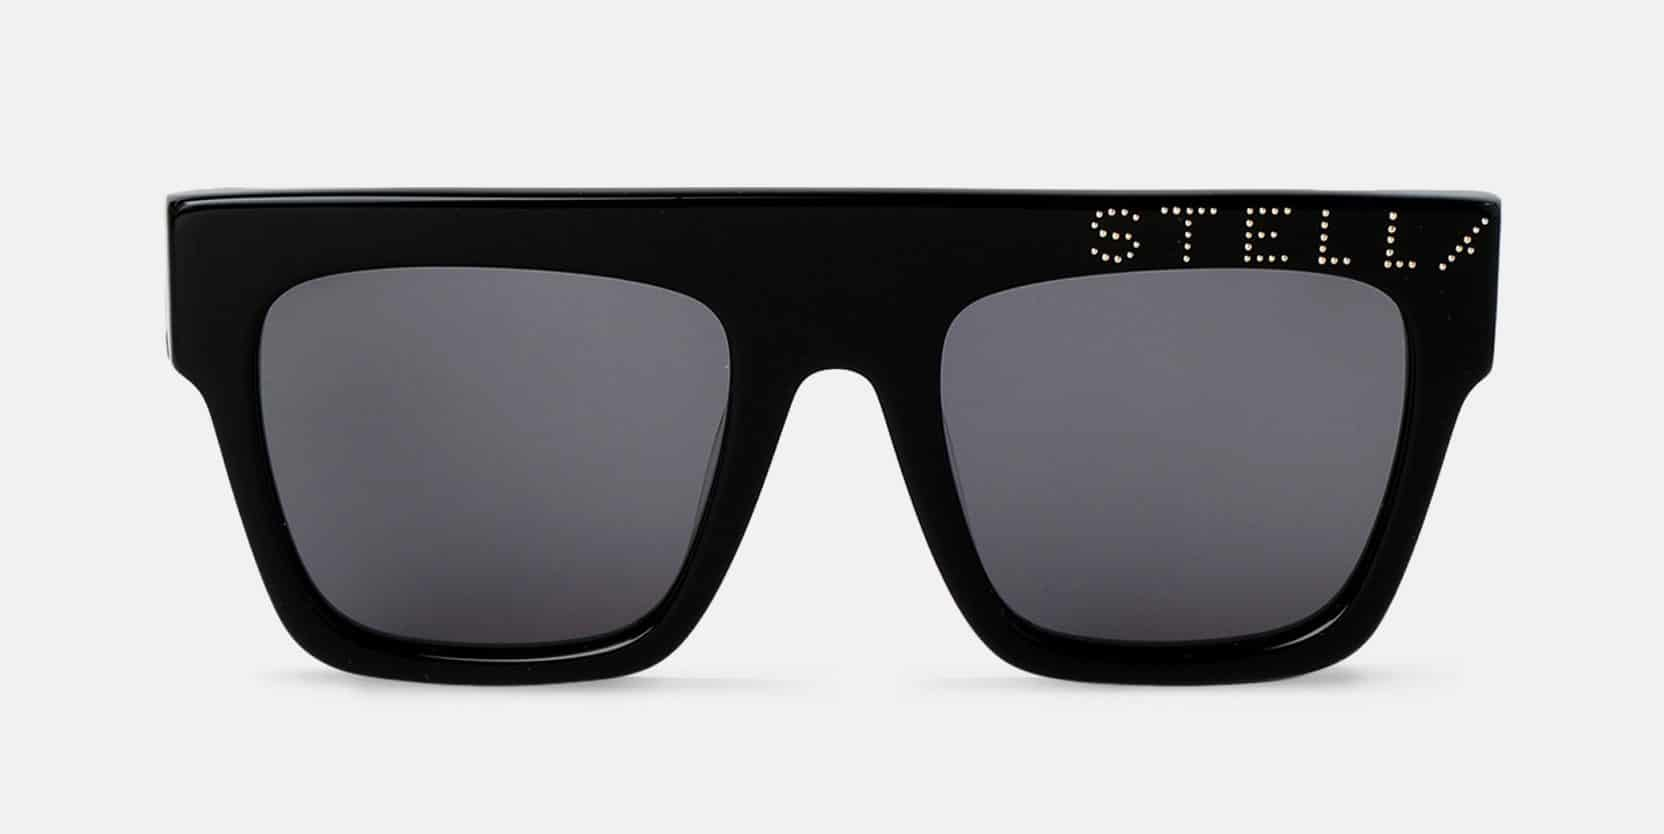 98ed2e8ba986 Acetate Sunglasses  Eco-Friendly or Just Greenwashing  - Ecocult